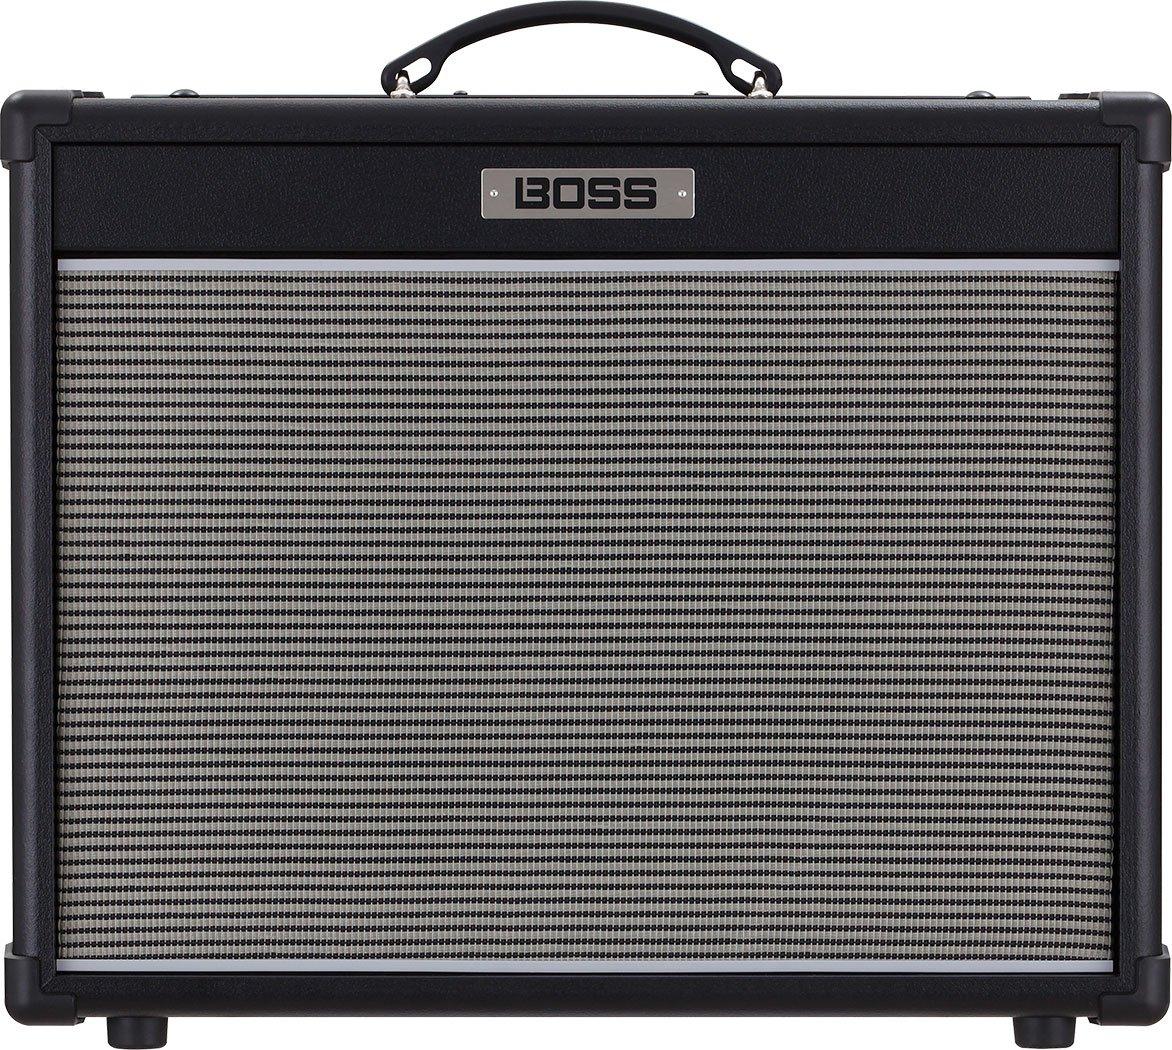 BOSS NEX-STAGE NEXTONE STAGE GUITAR AMP